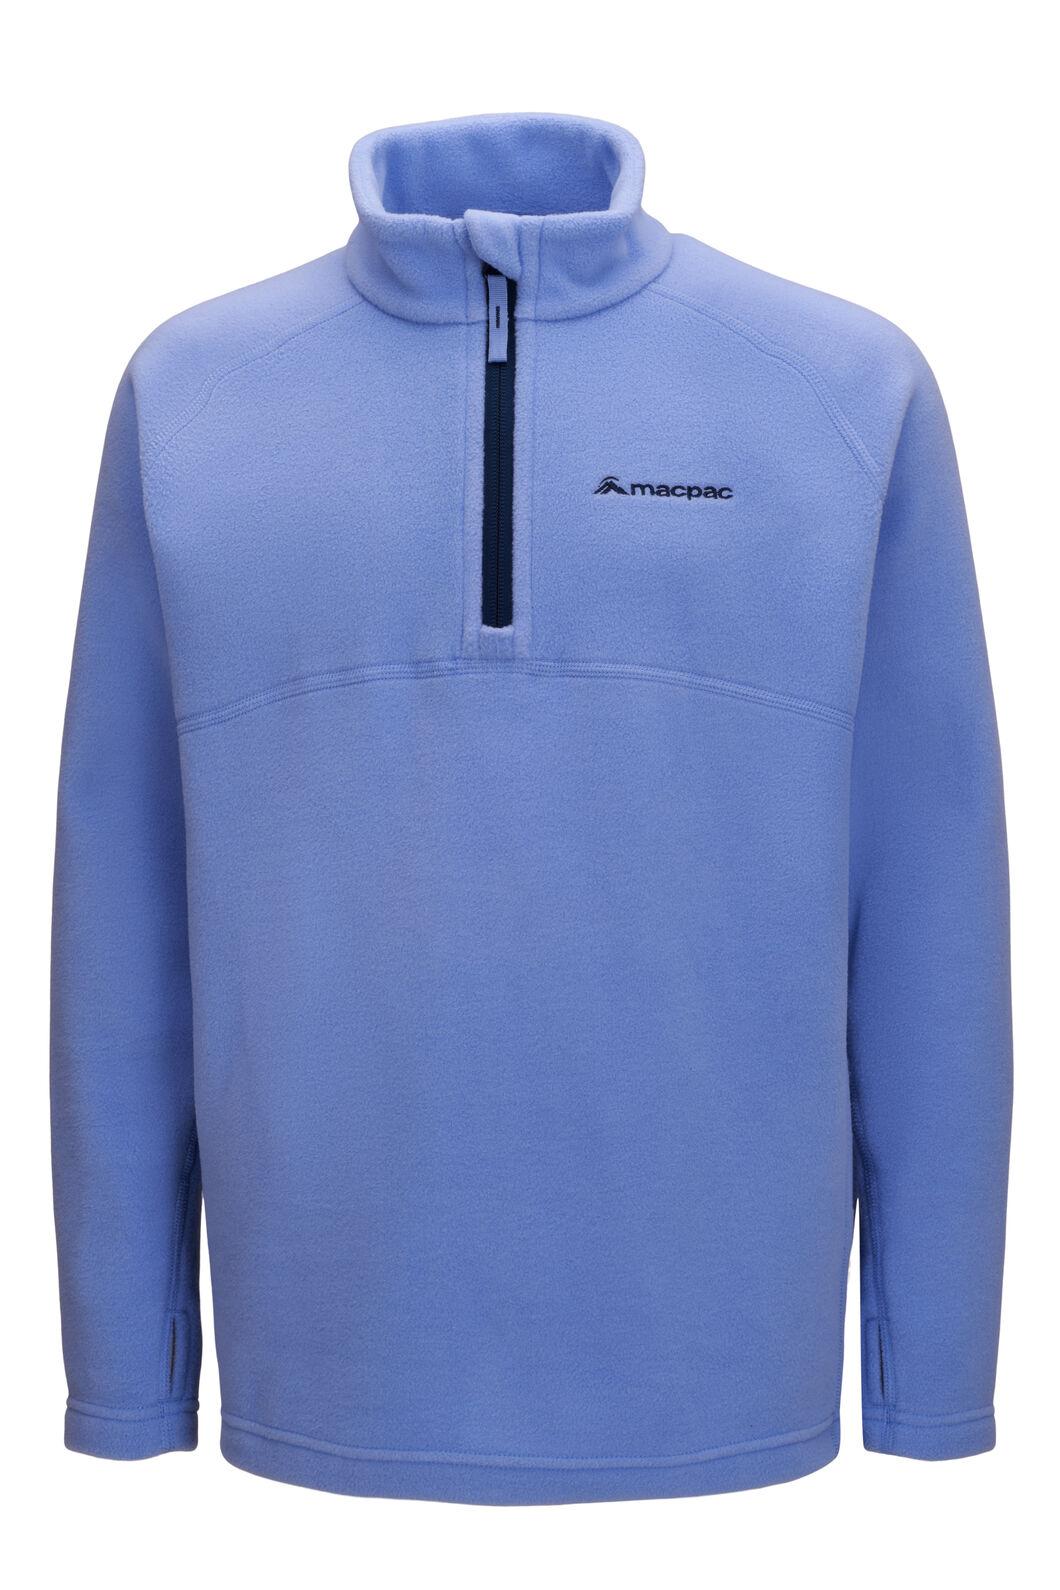 Macpac Tui Polartec® Fleece Pullover — Kids', Cornflower, hi-res